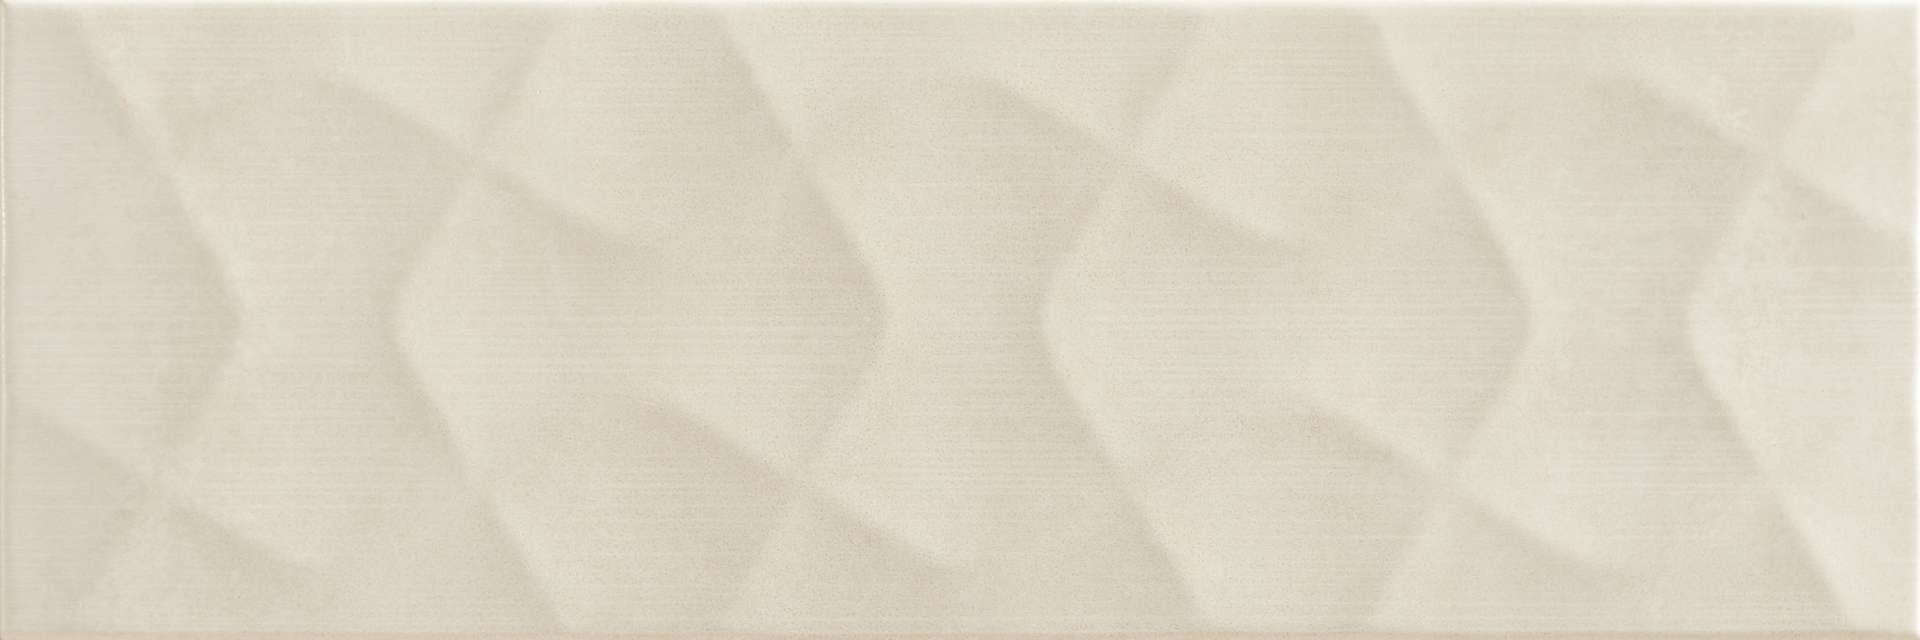 Faianță pentru baie Pamesa Potsdam Relief Blanco 200x600 texturată și satin bej / 9